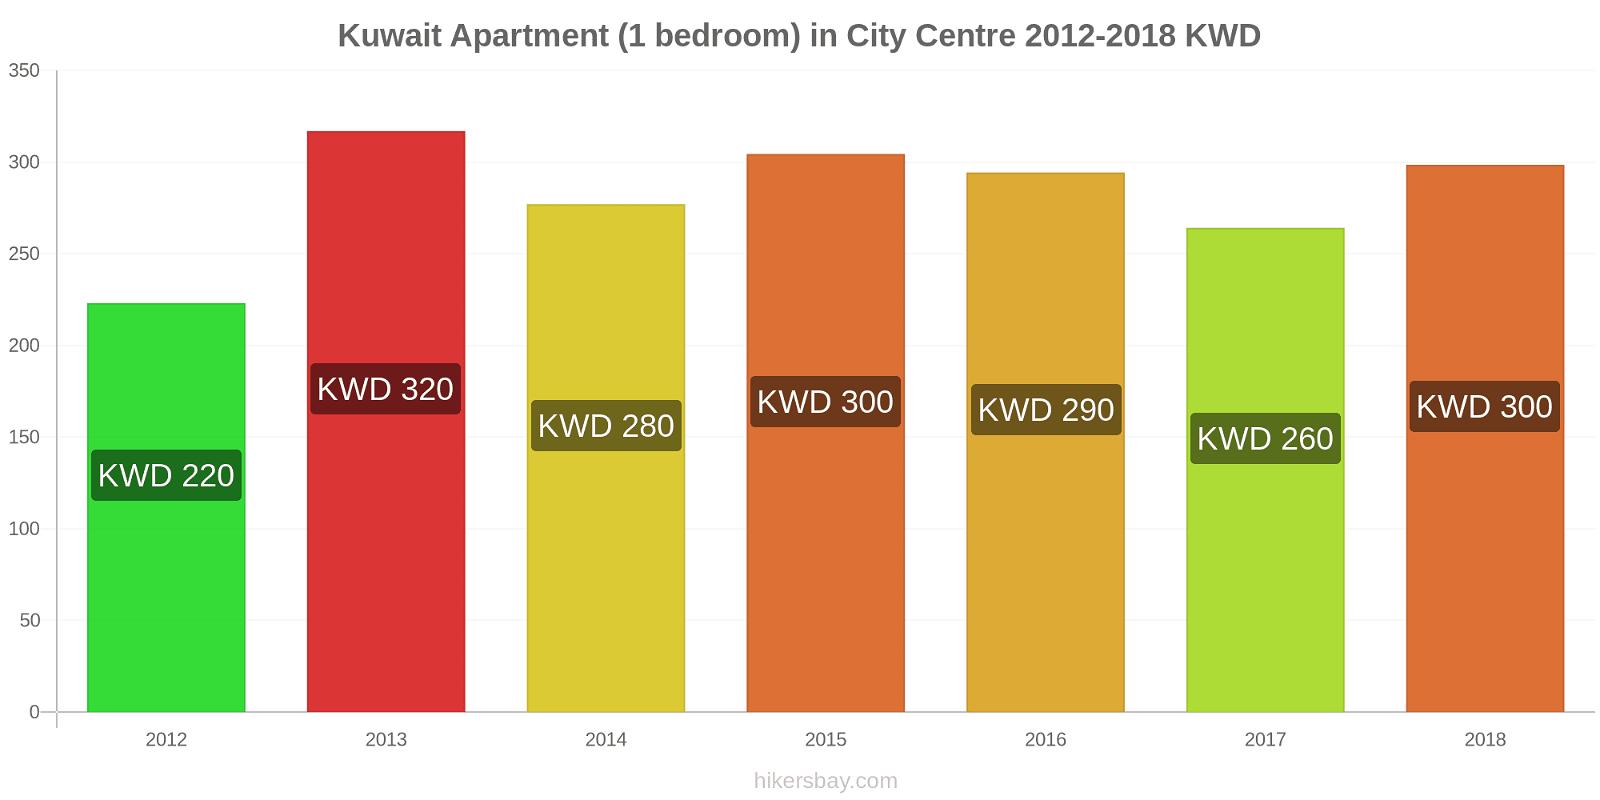 Kuwait price changes Apartment (1 bedroom) in City Centre hikersbay.com